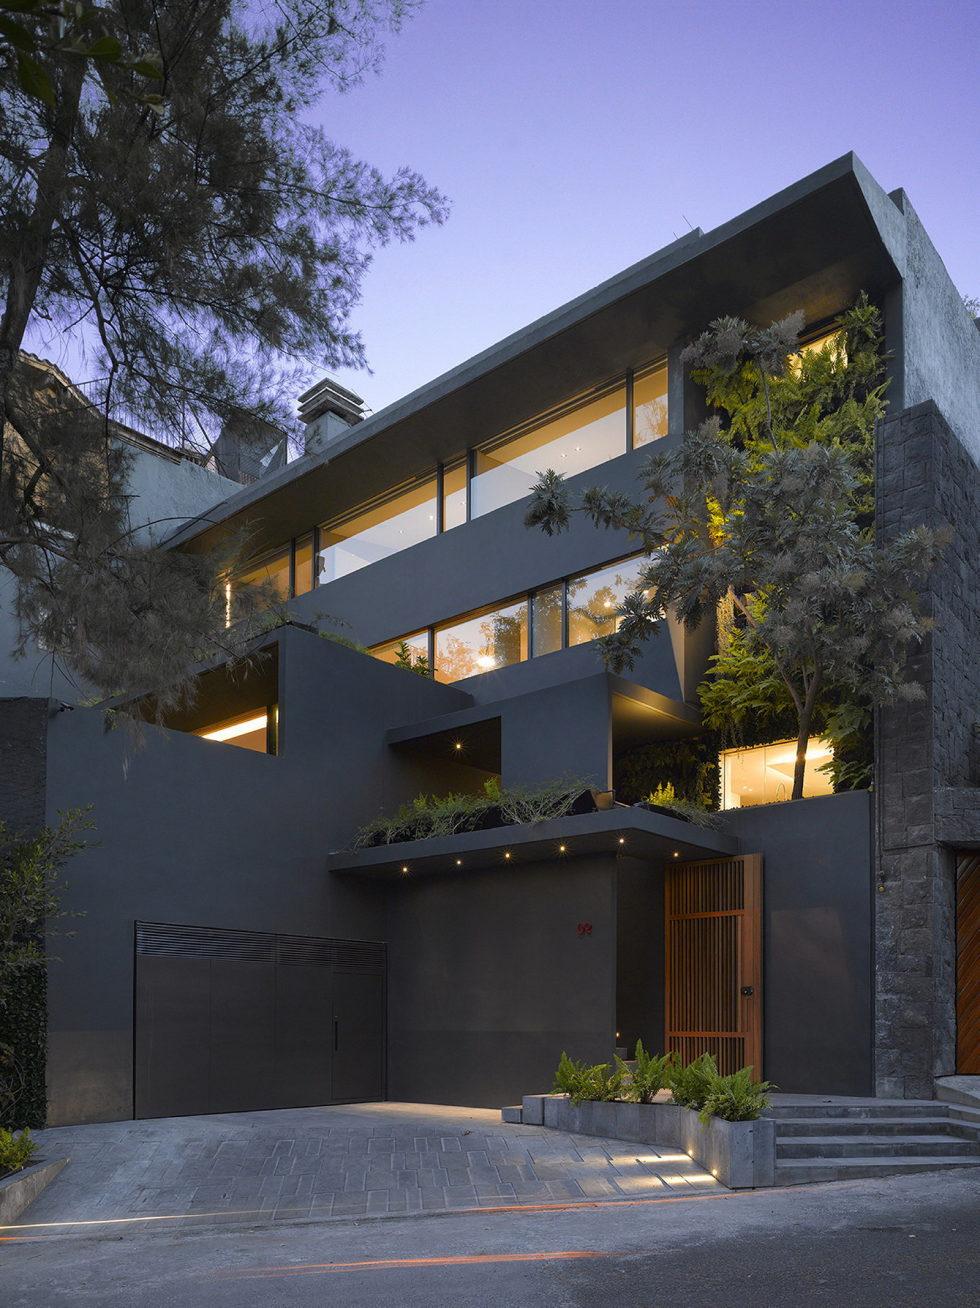 The Barrancas House In Mexico From EZEQUIELFARCA Studio 17